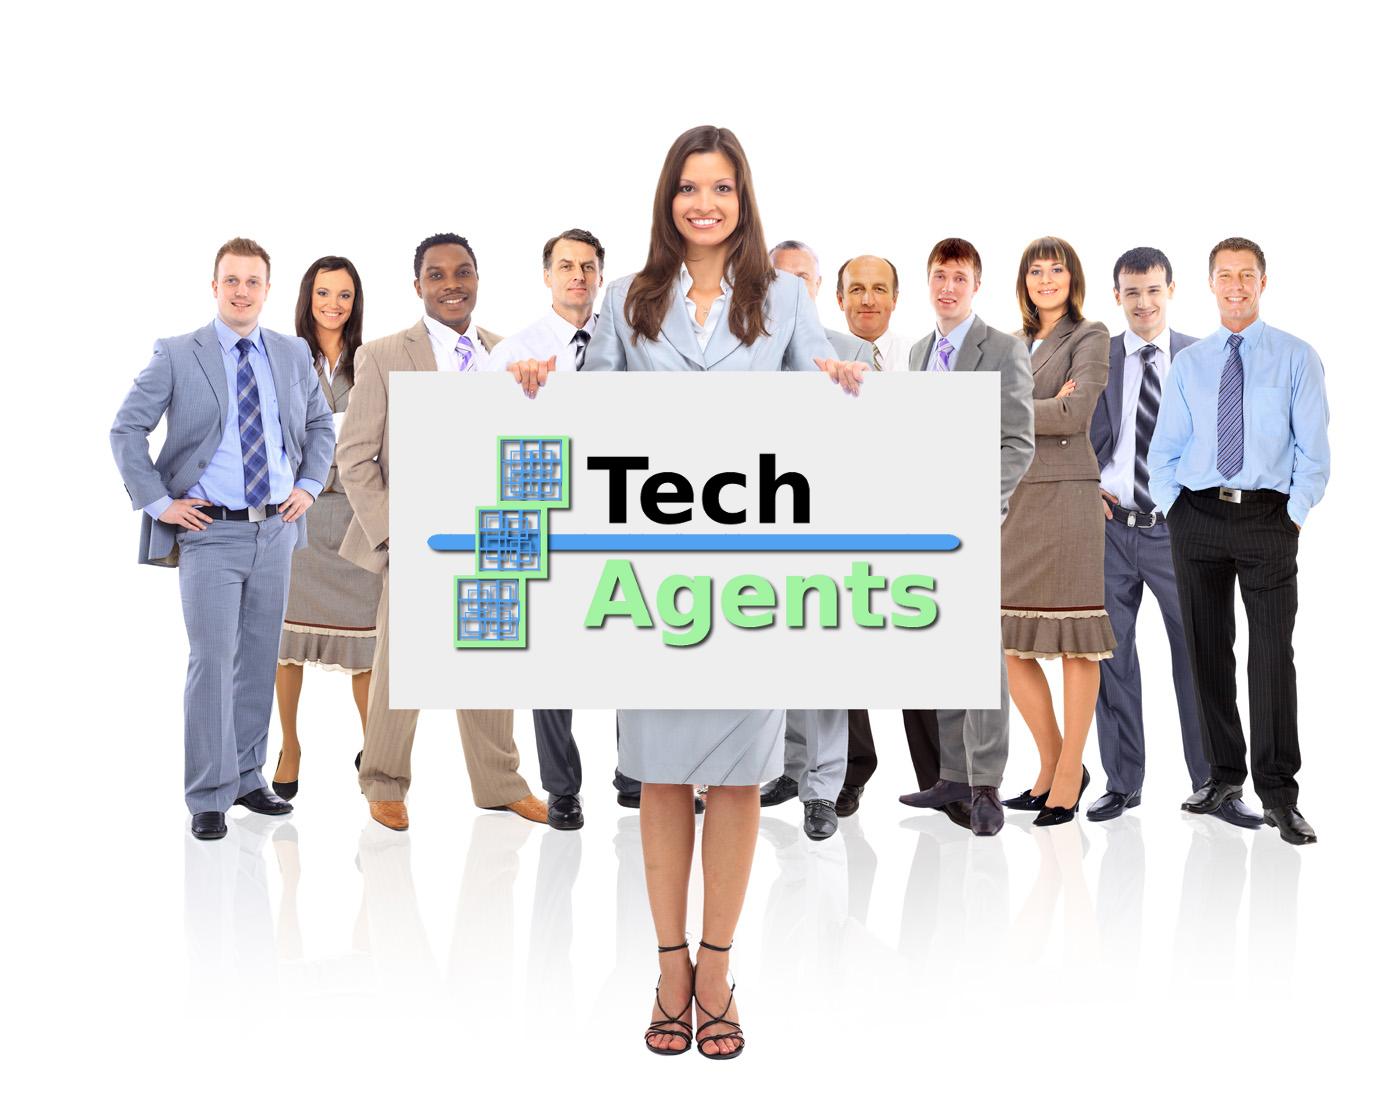 TechAgentsWithPeople2.png